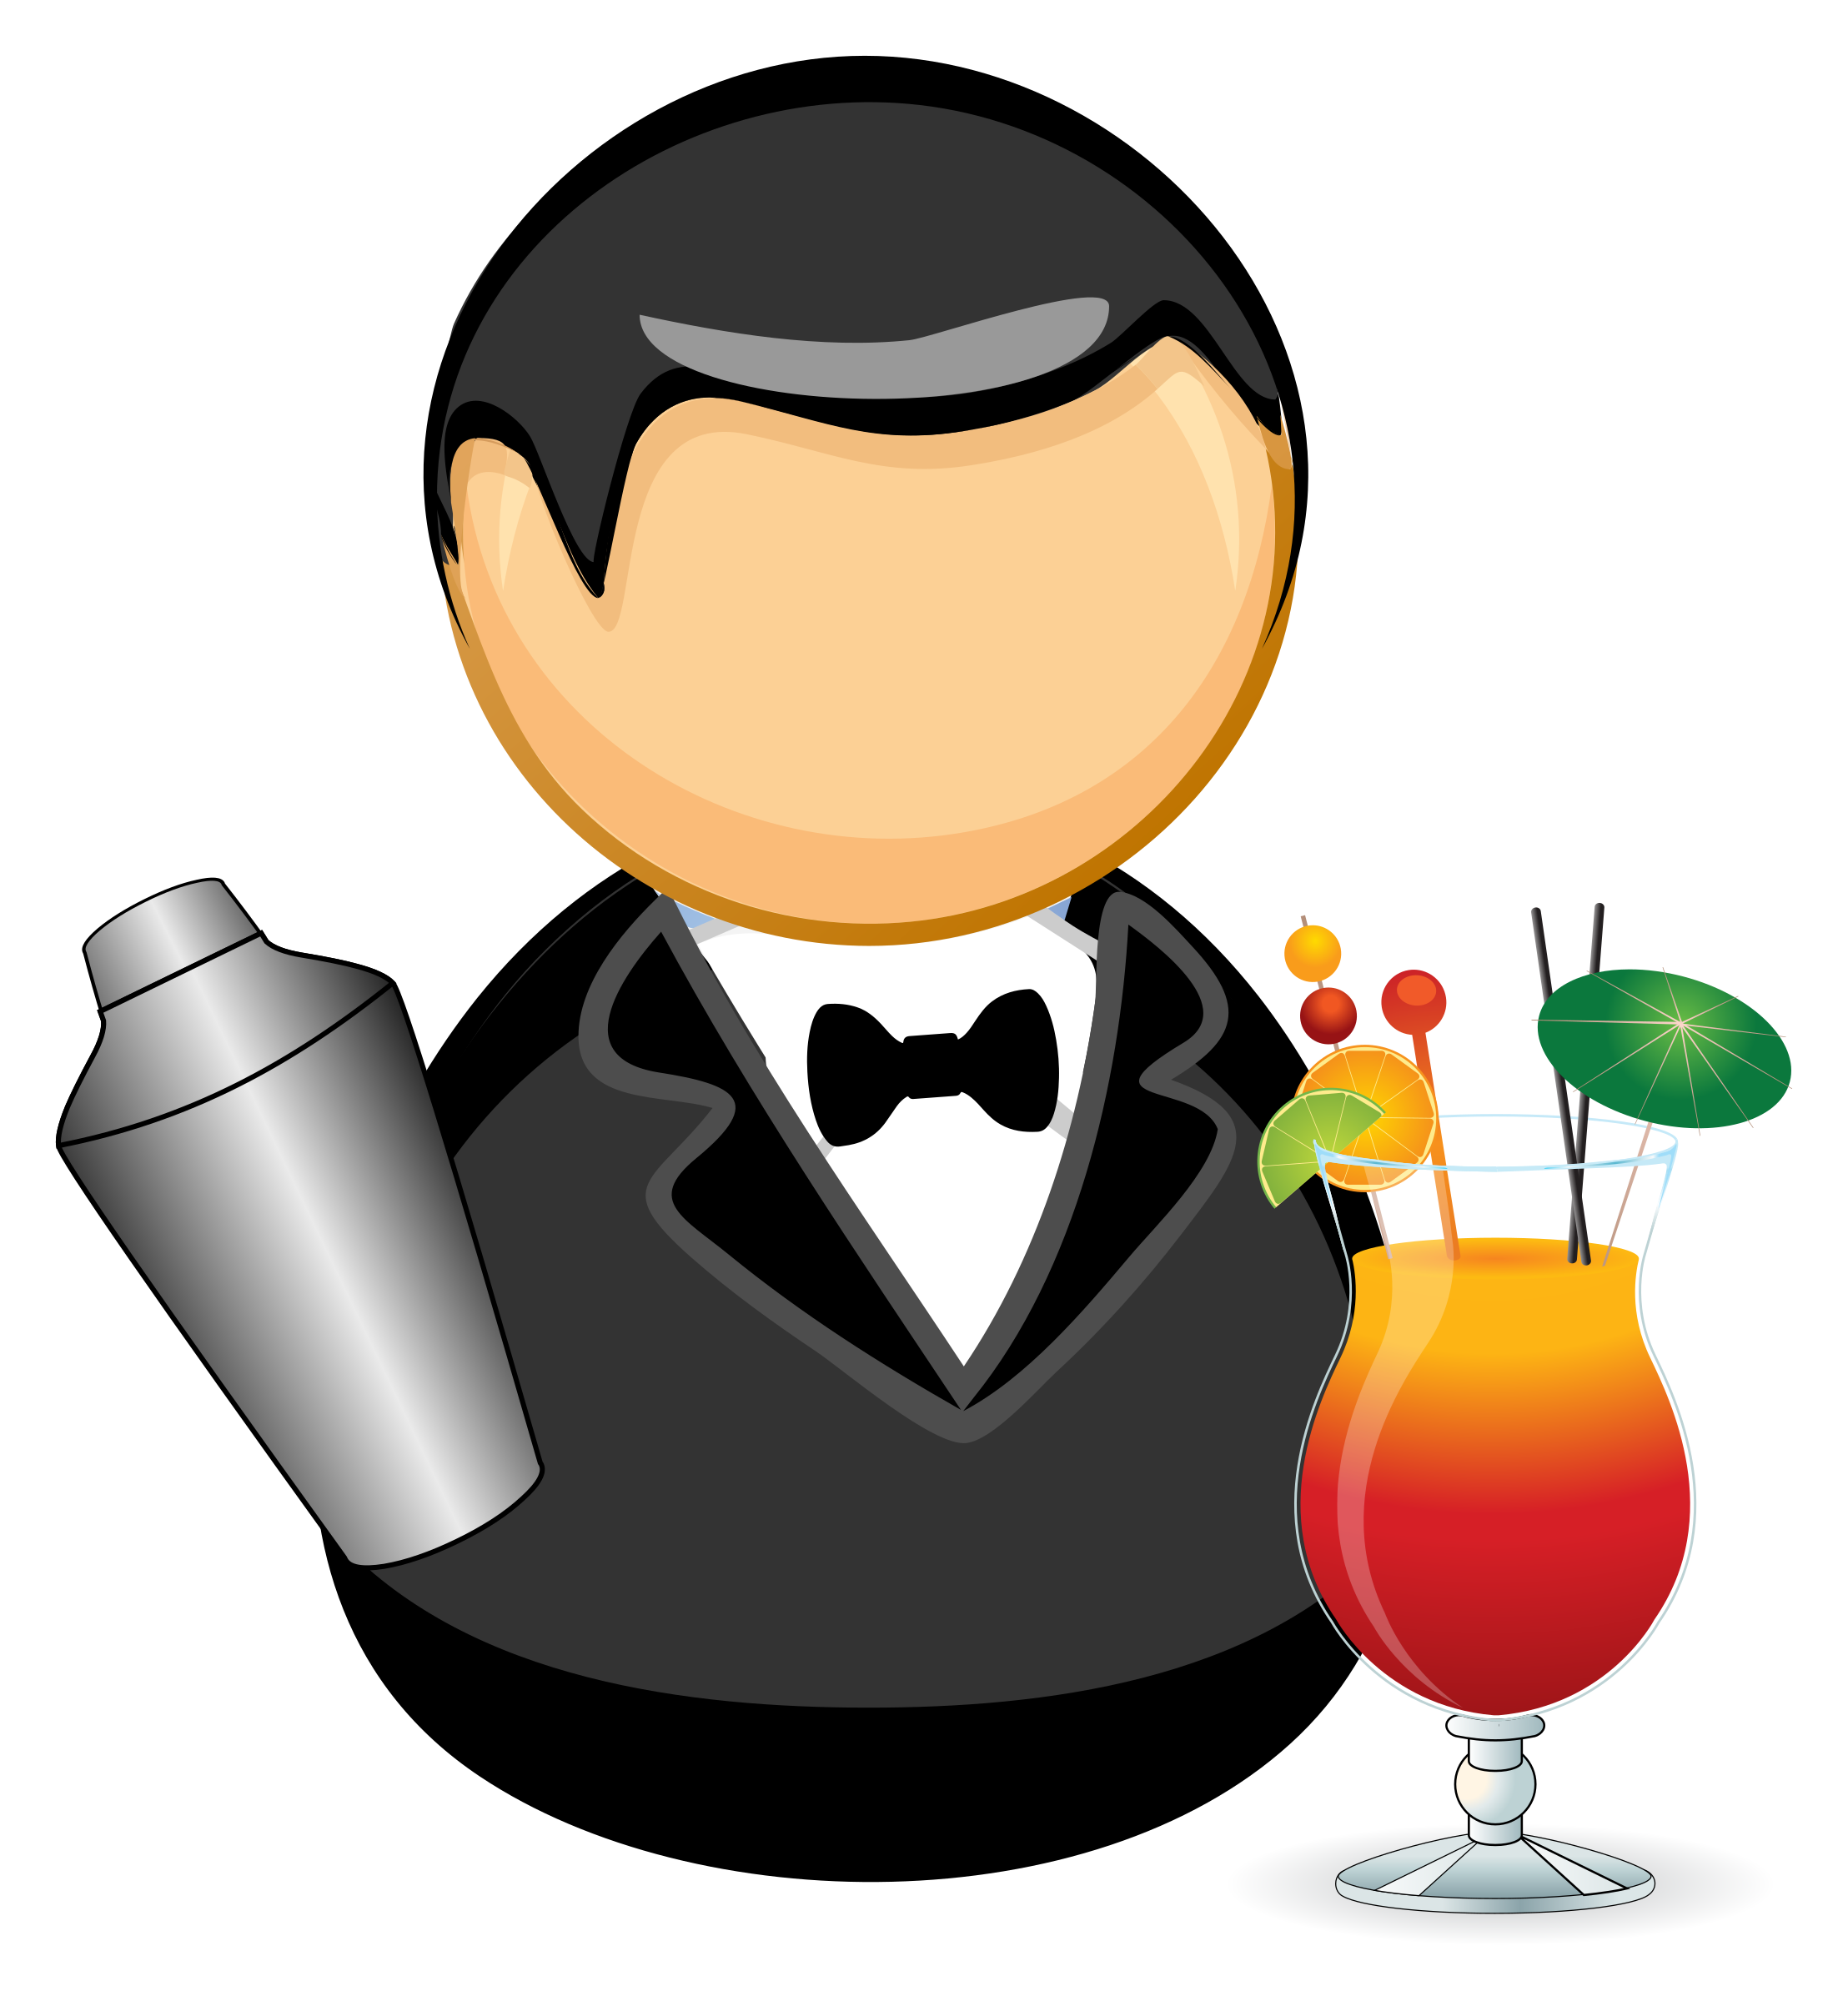 Barman big image png. Retro clipart bartender